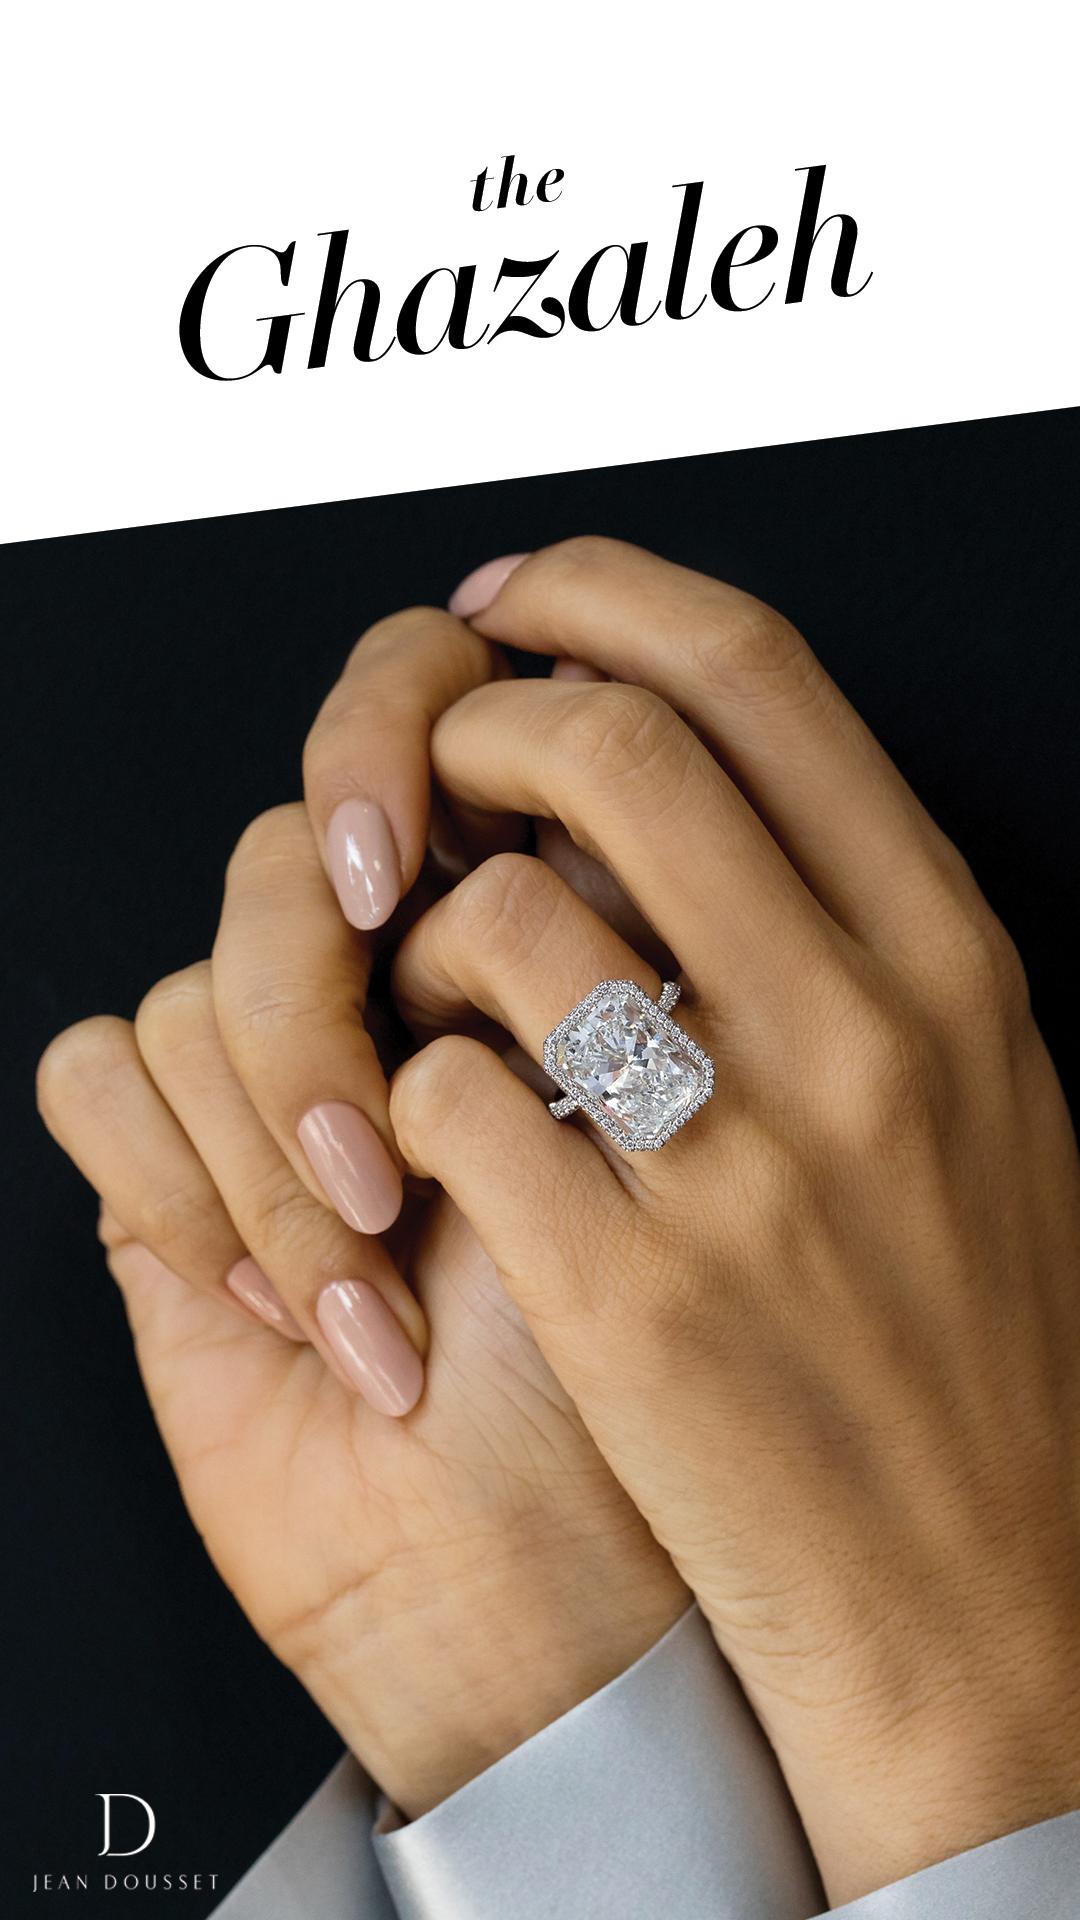 Meet Ghazaleh 325 Brilliant Accent Stones Moissanite Engagement Ring White Gold White Gold Engagement Rings Vintage Vintage Engagement Rings Unique